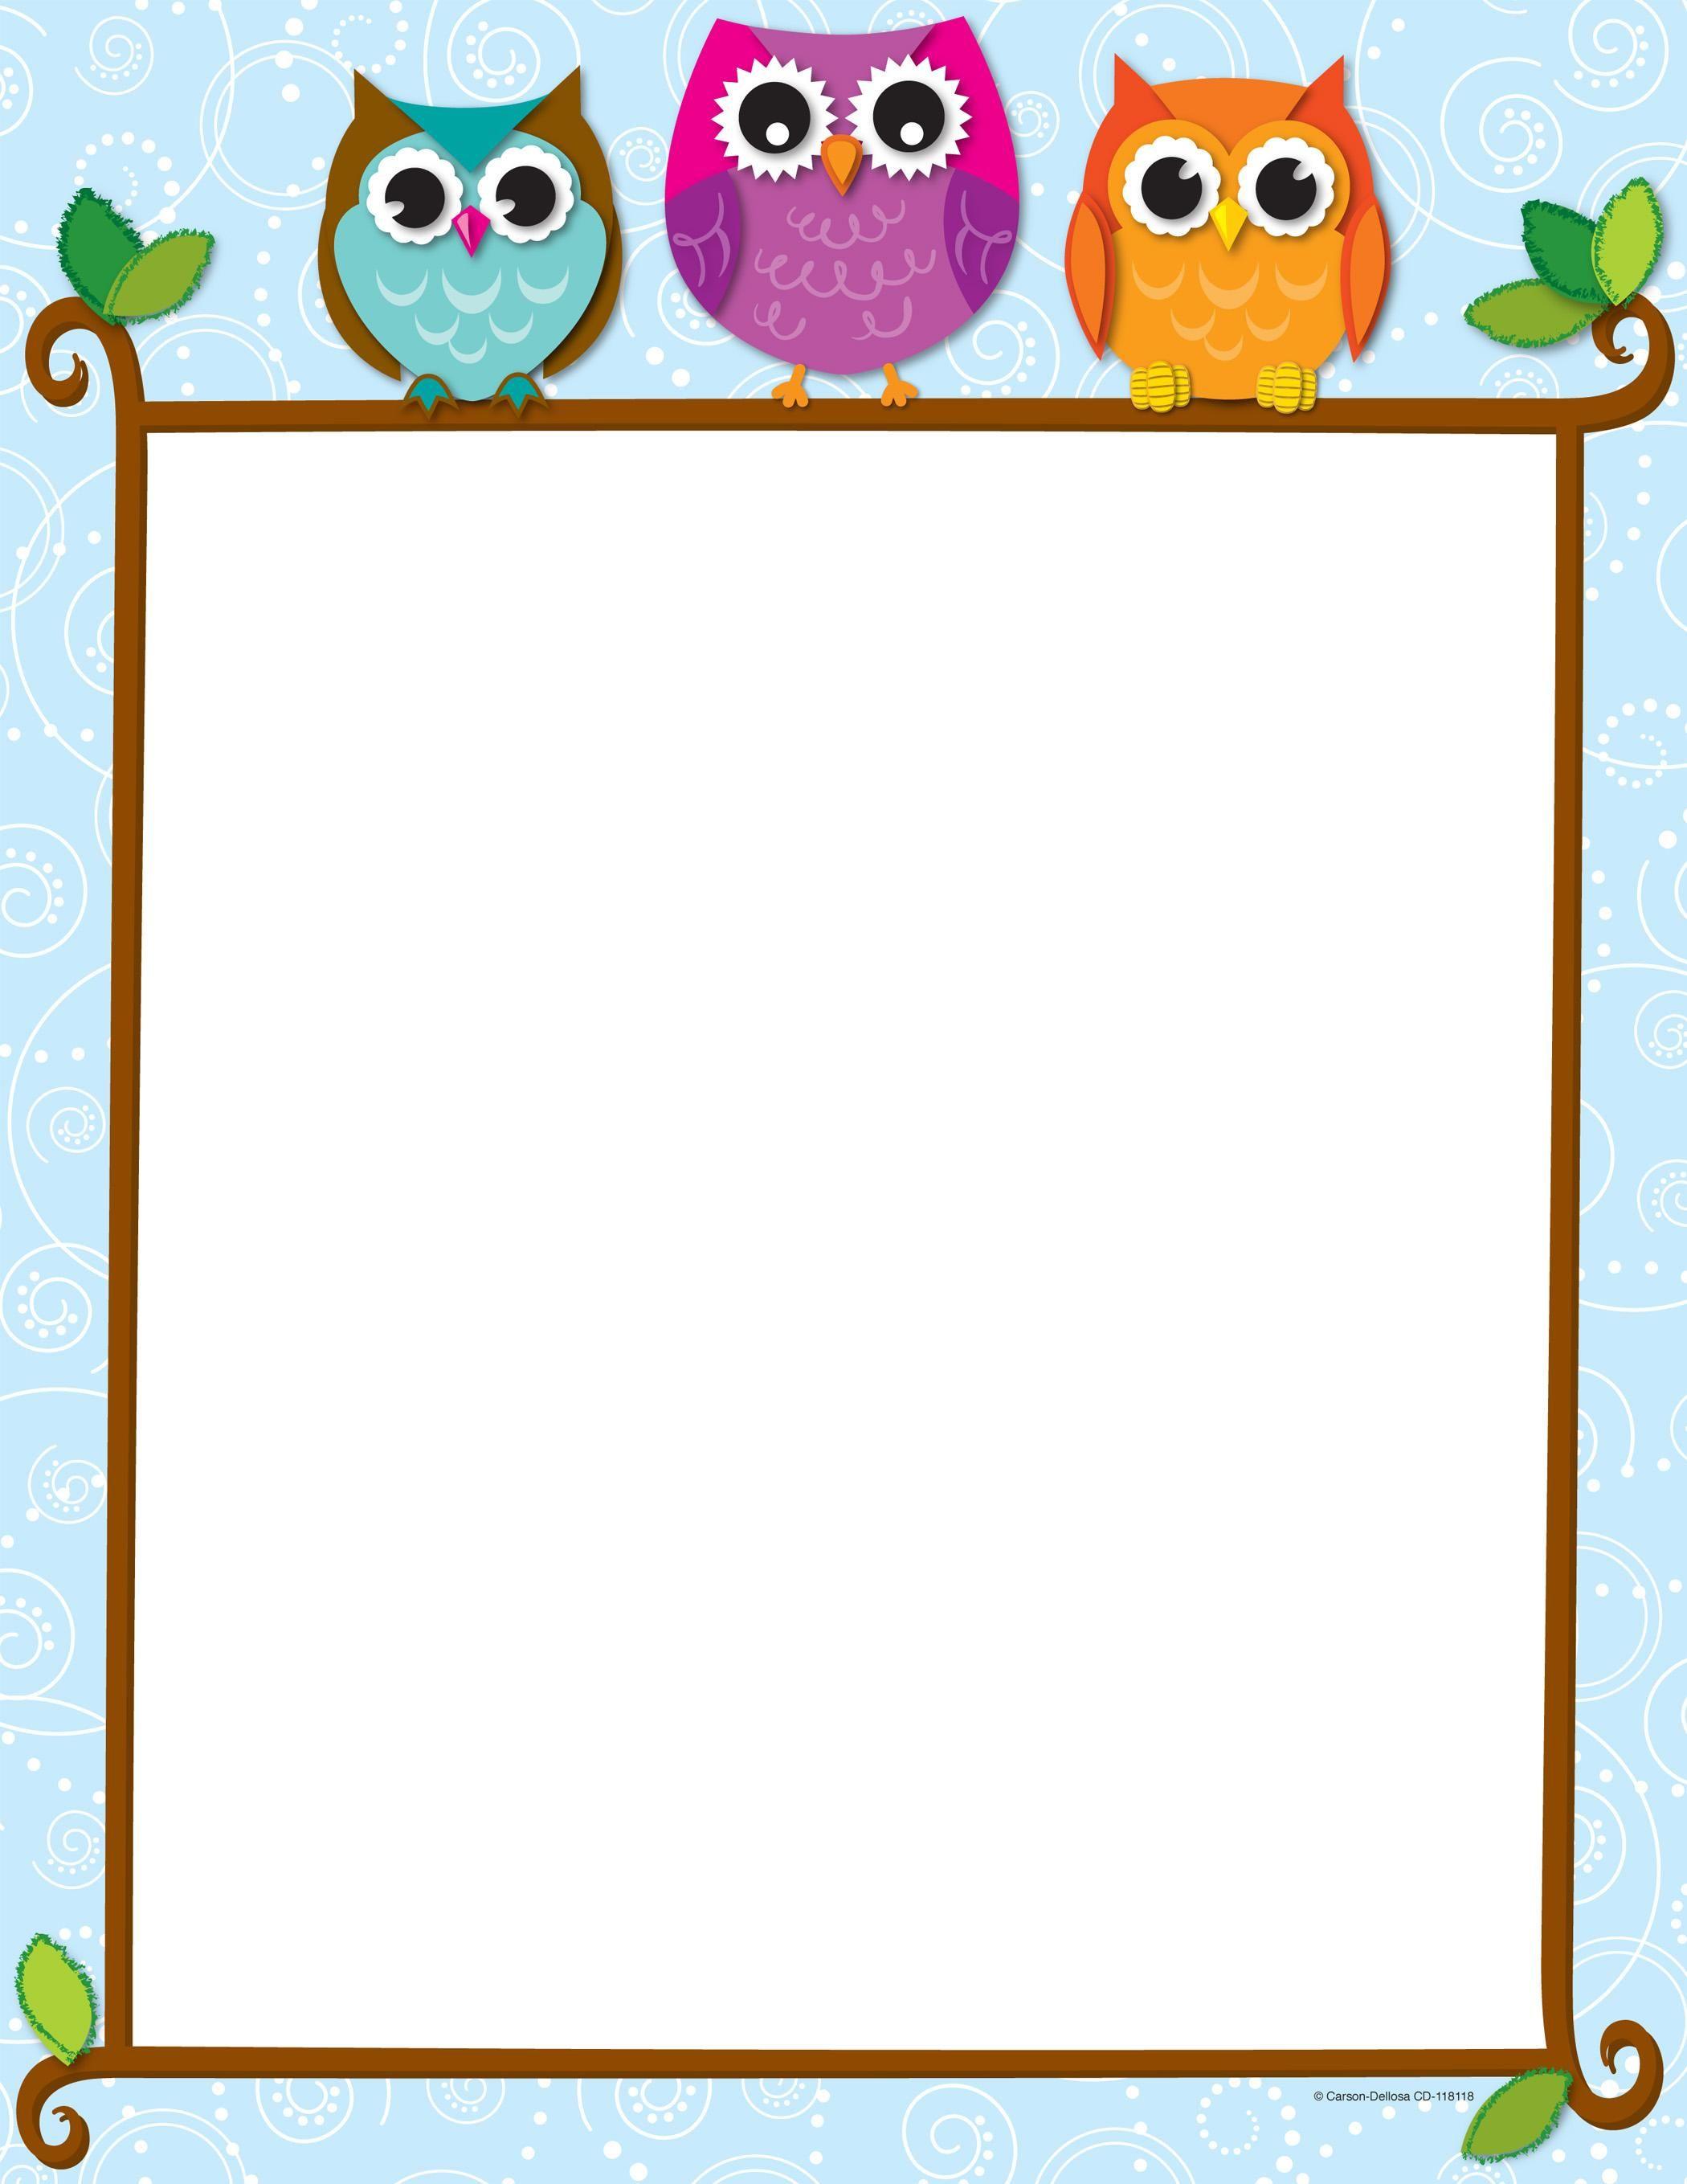 Free+Owl+Border+Paper | tarjetas para clases | Pinterest ...